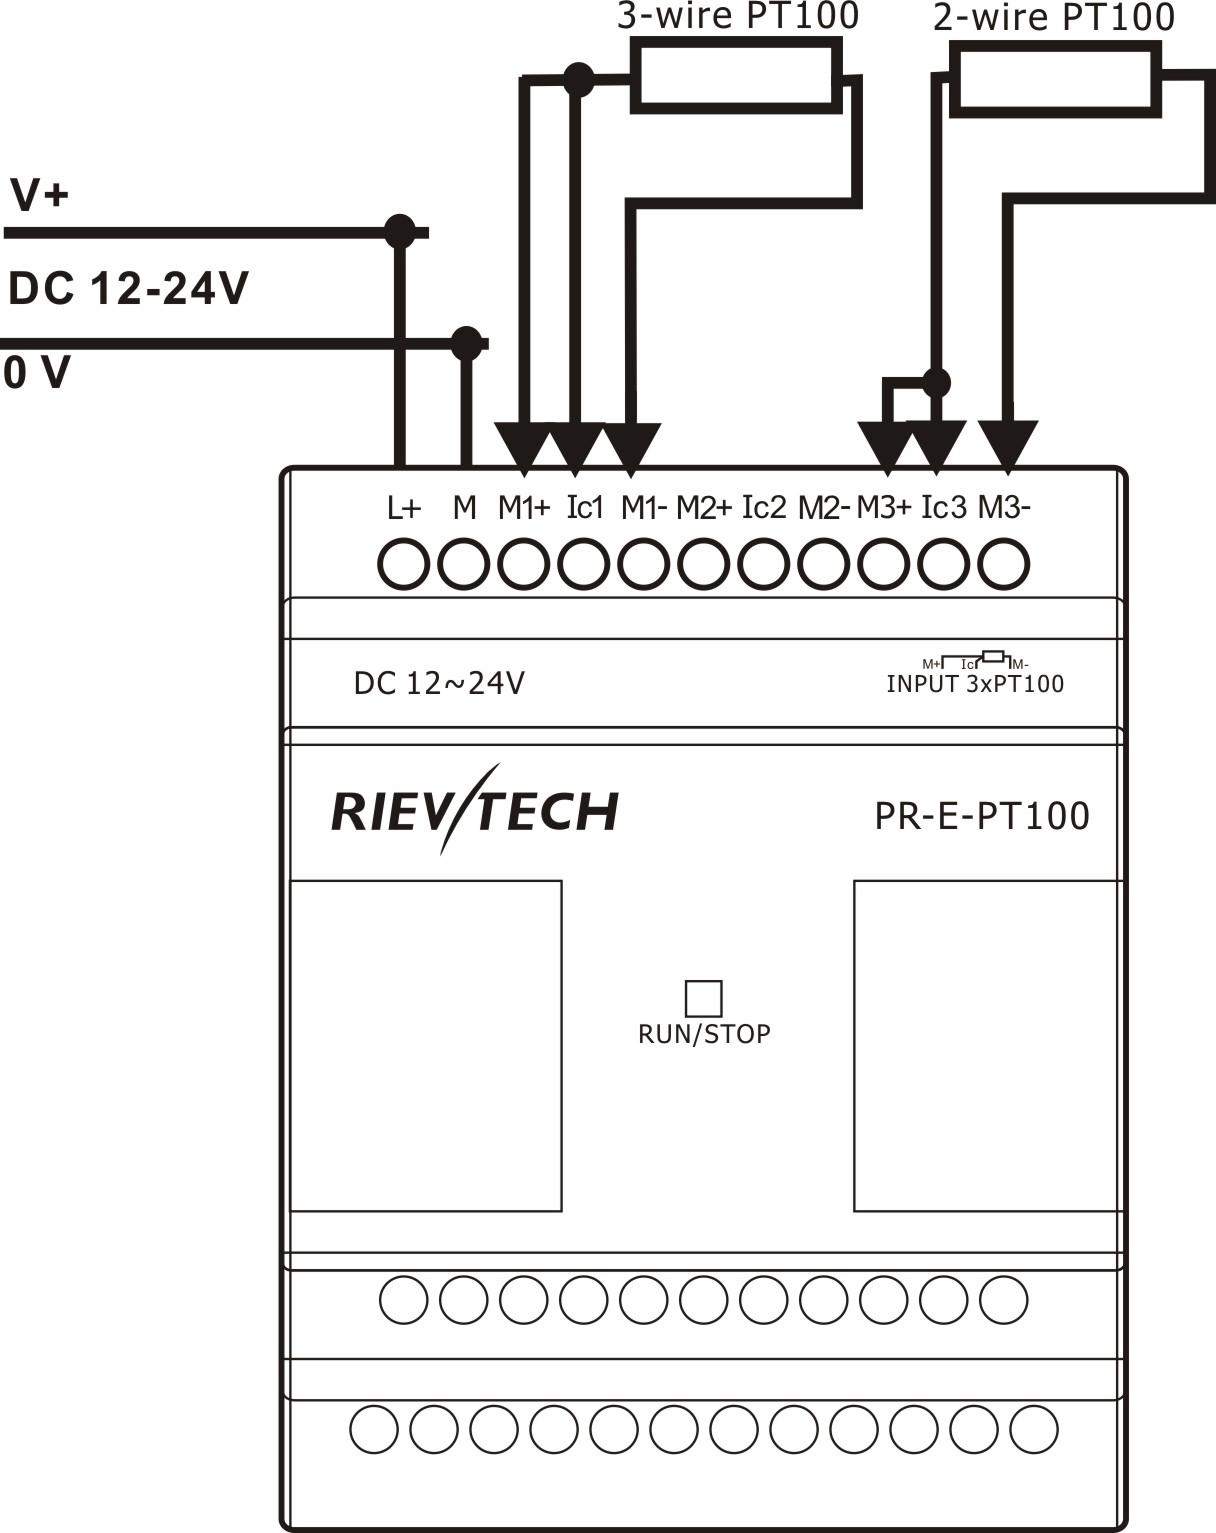 12v dc plc wiring 12v dc regulated power supply circuit diagram pr e pt100 buy plc ethernet module sms plc product on